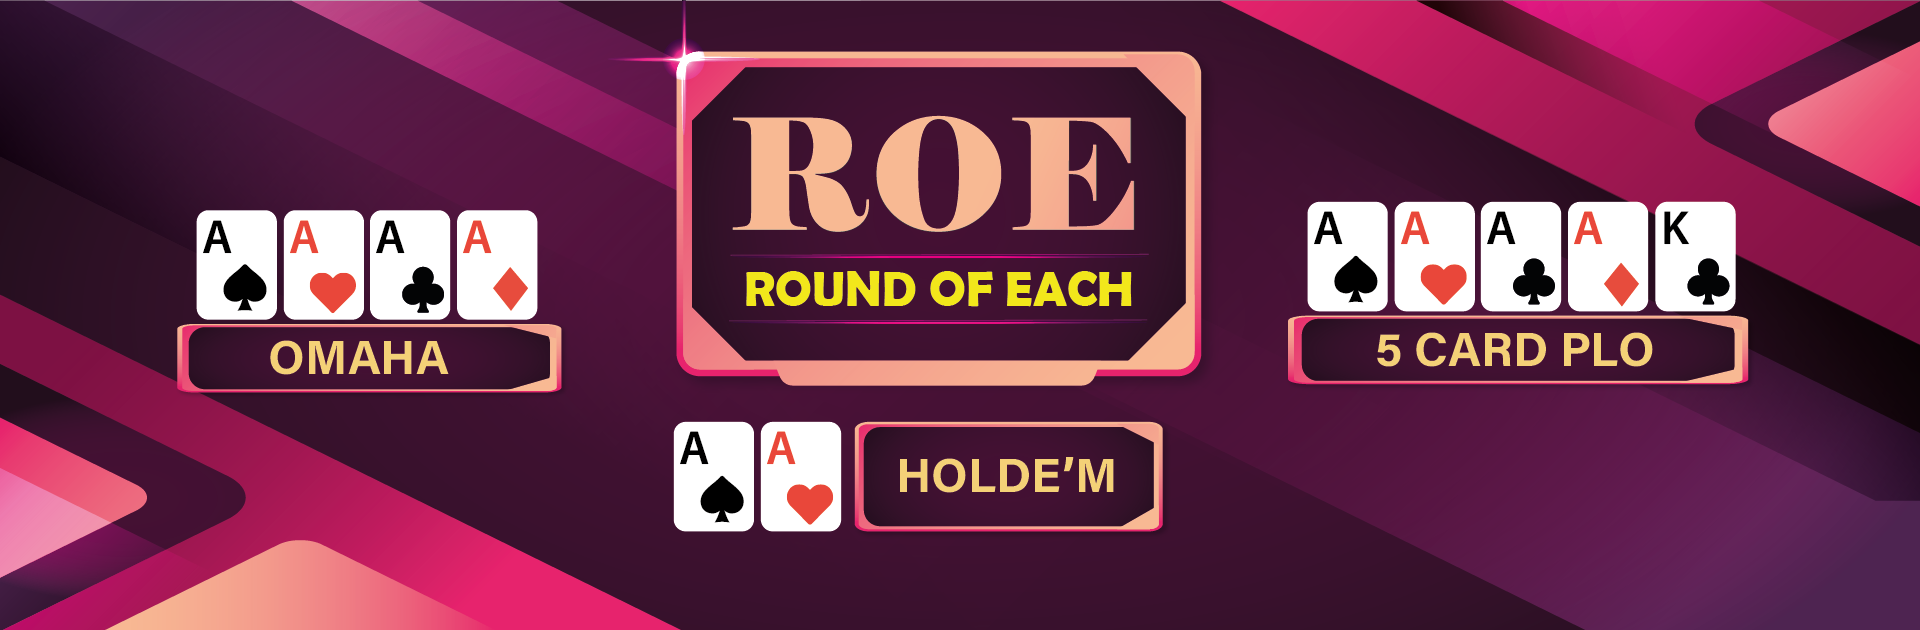 Round of Each